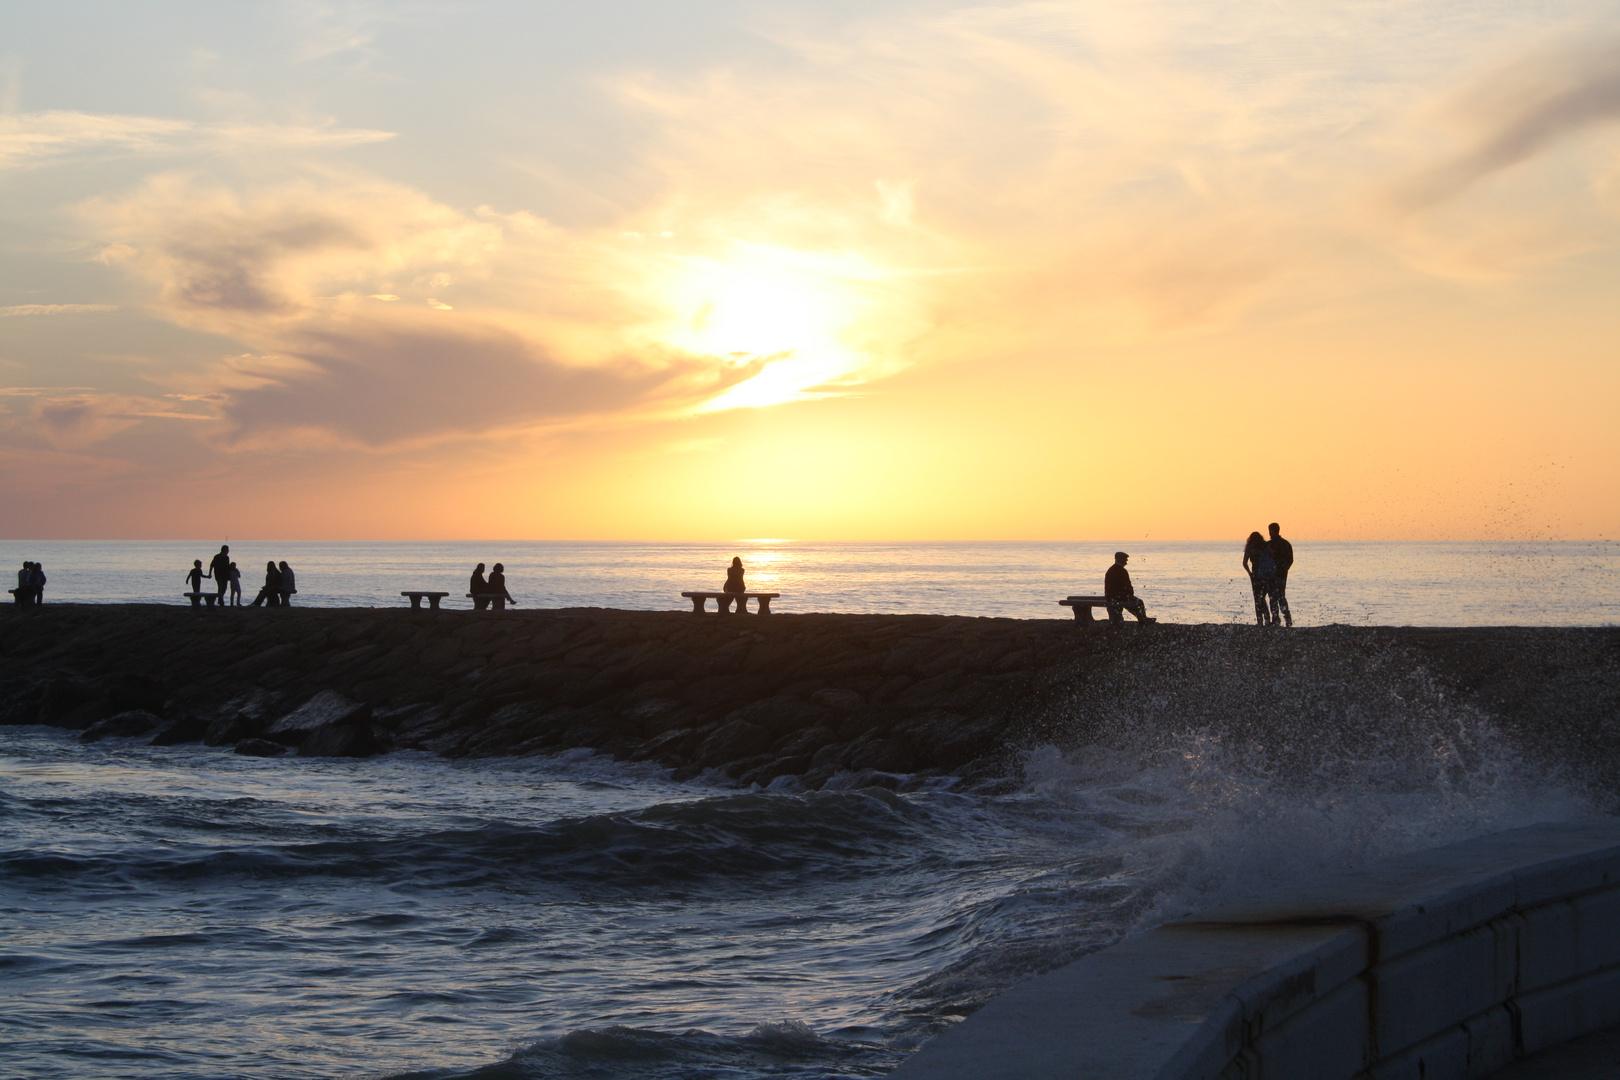 Puesta de sol en Rota (Cádiz)